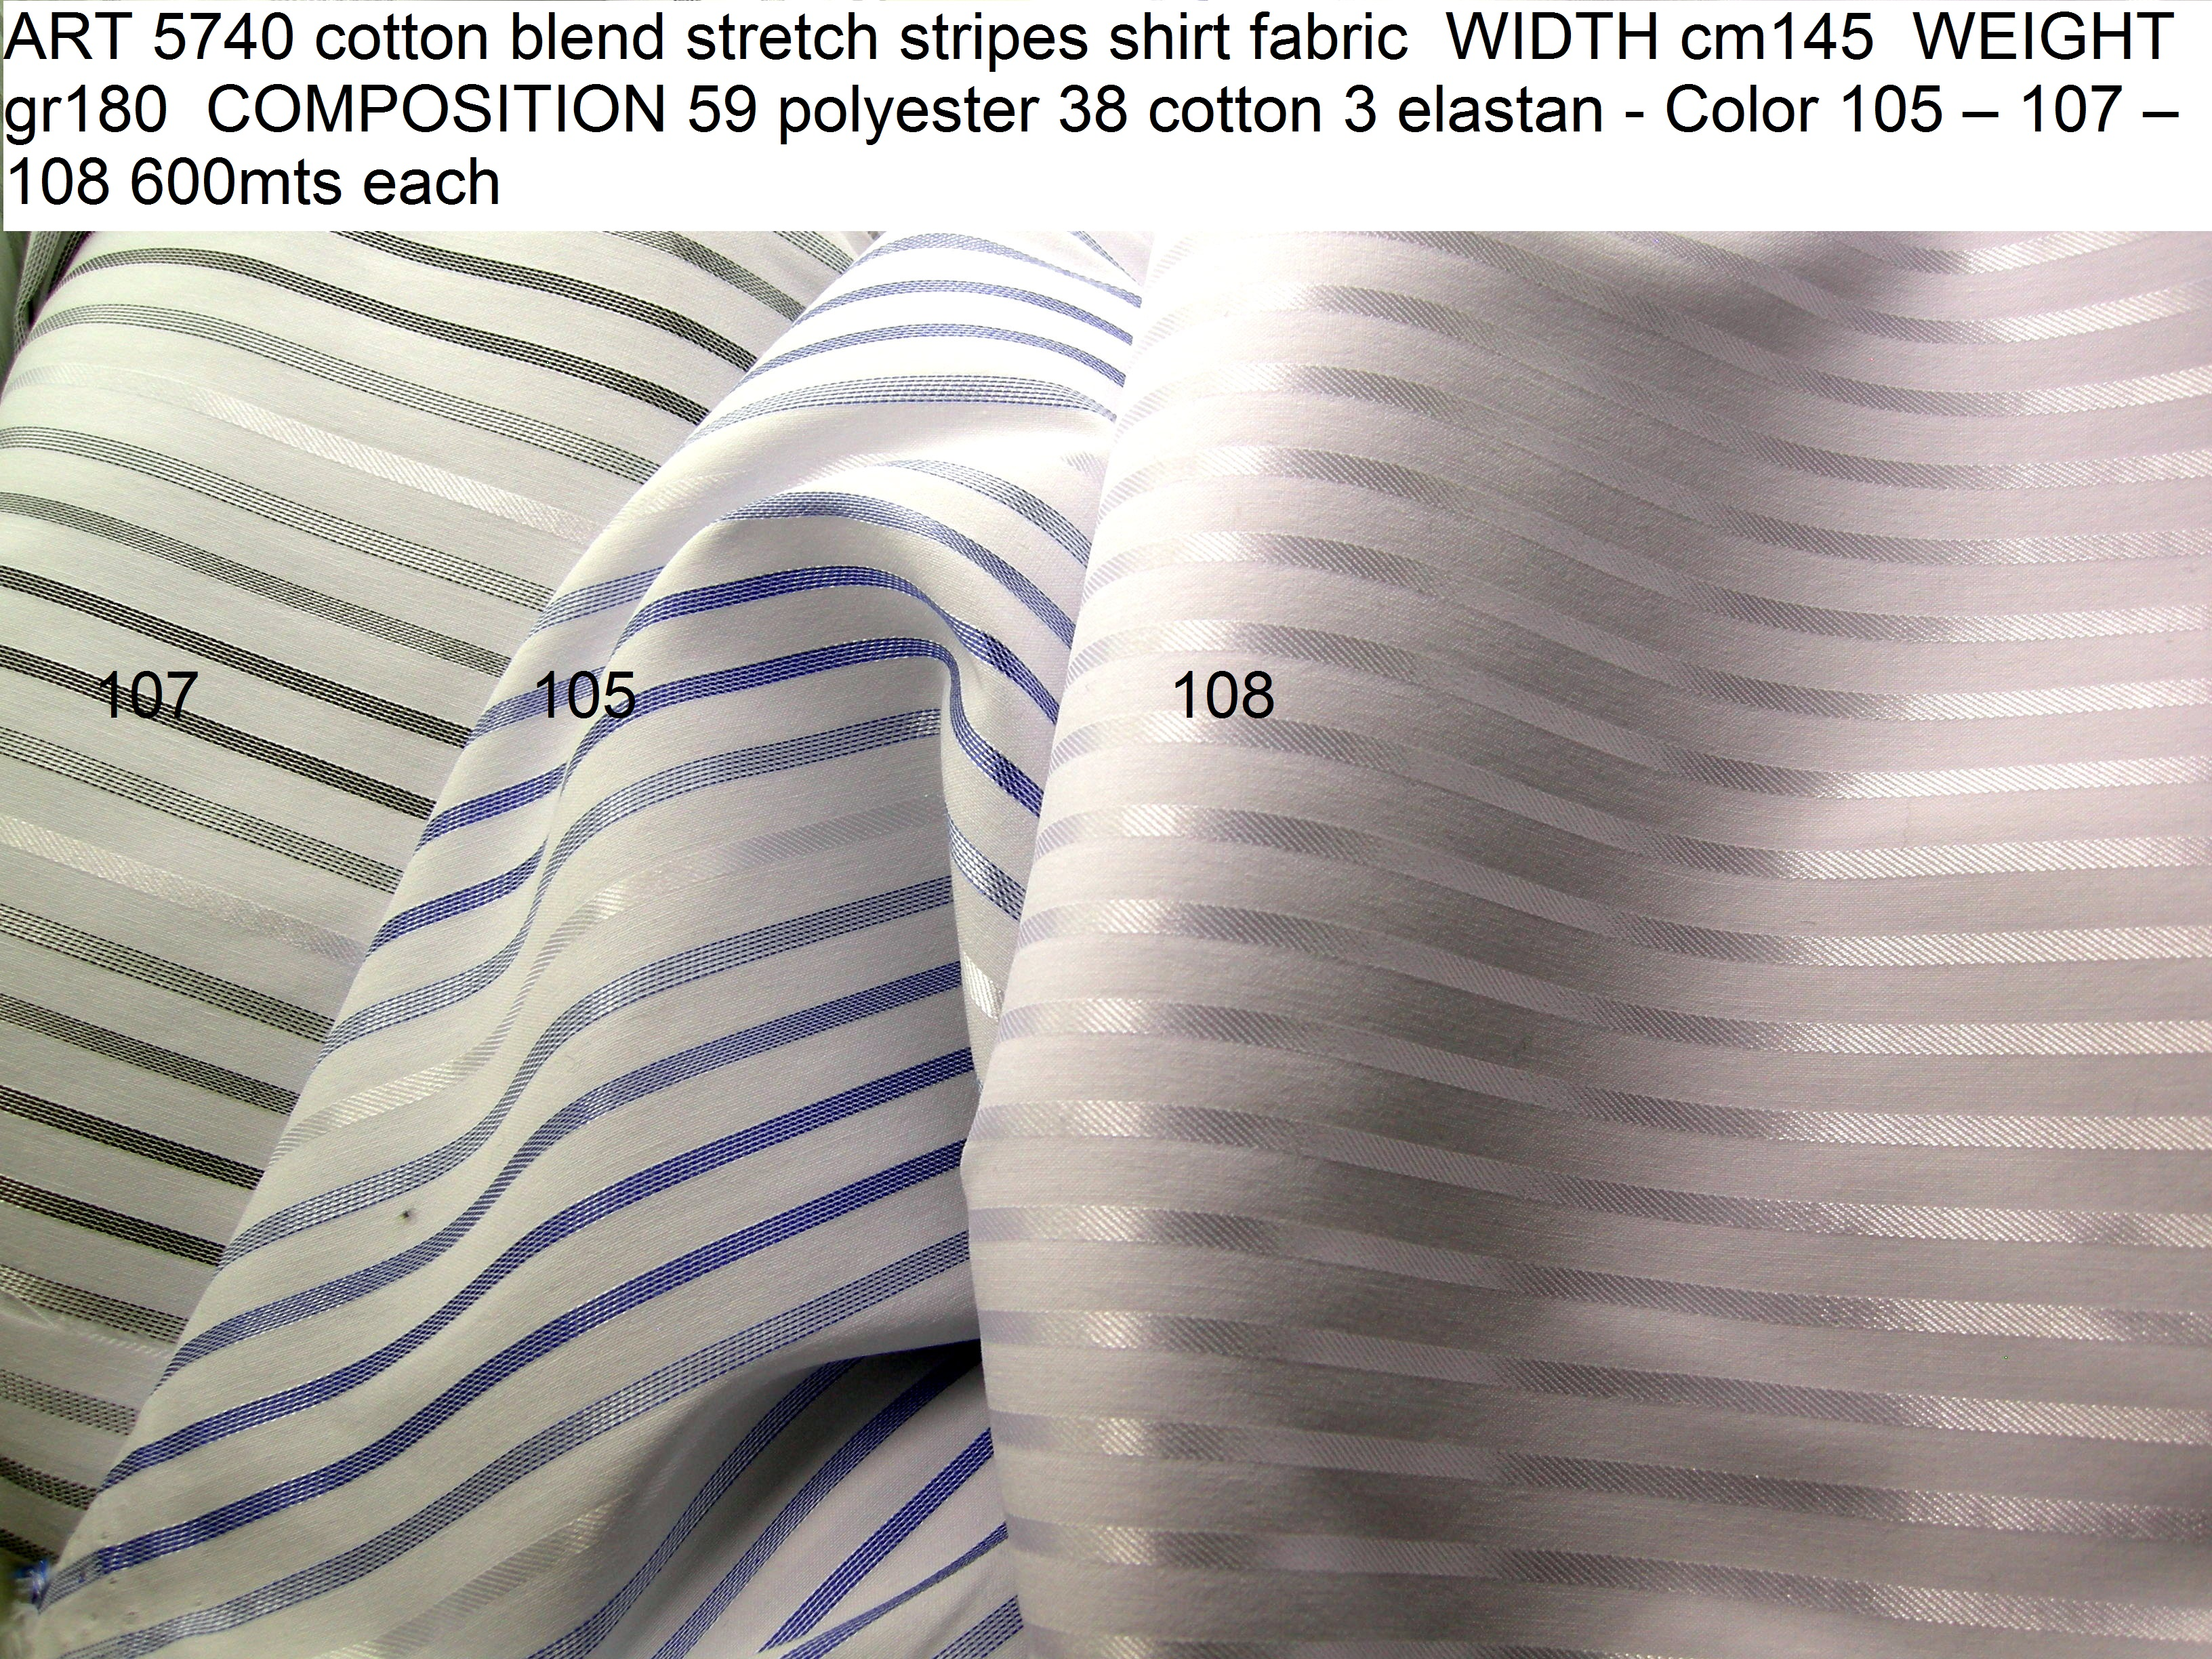 ART 5740 cotton blend stretch stripes shirt fabric WIDTH cm145 WEIGHT gr180 COMPOSITION 59 polyester 38 cotton 3 elastan - Color 105 – 107 – 108 600mts each